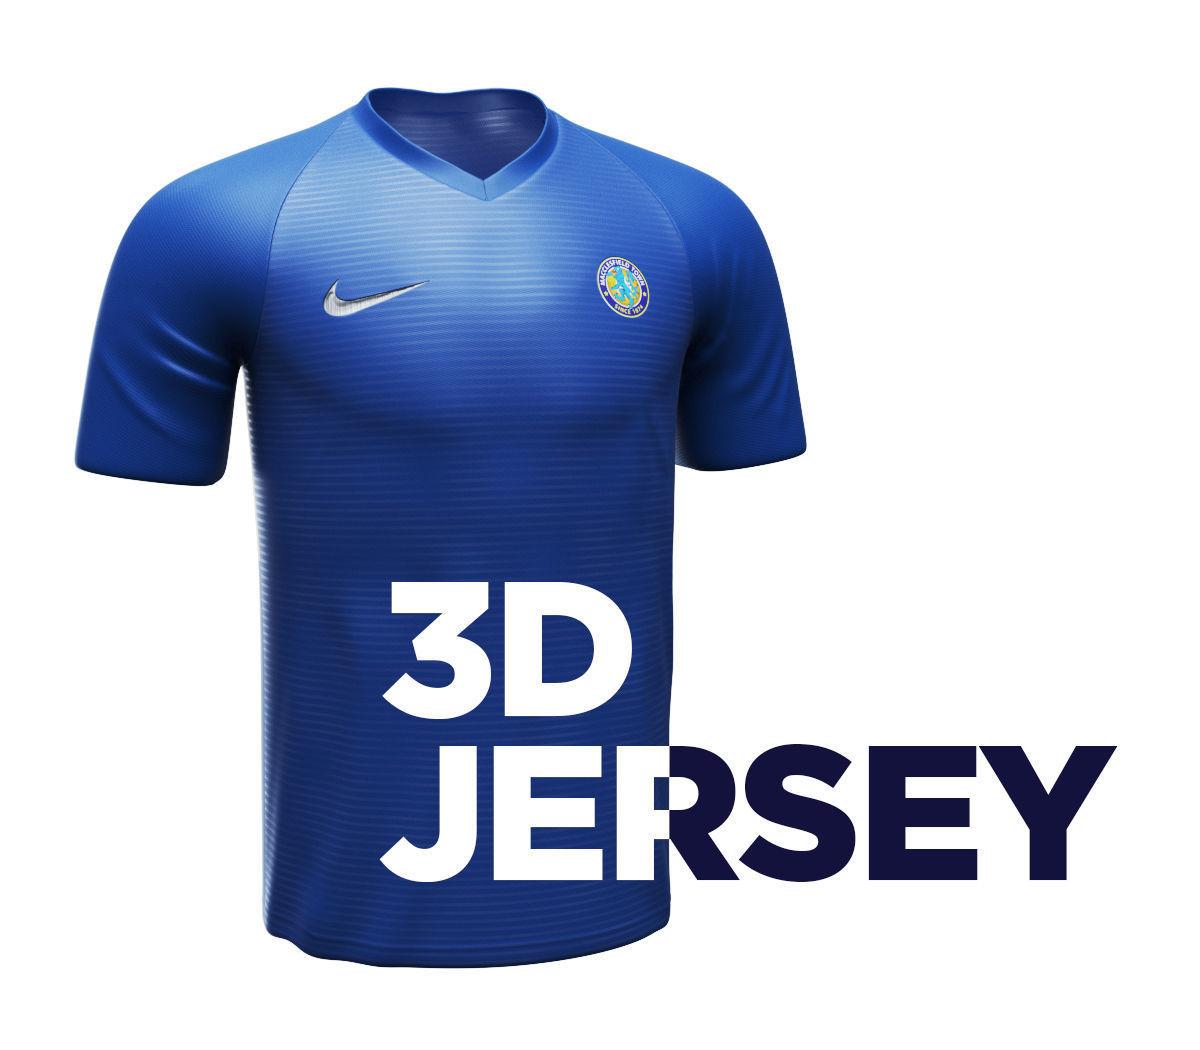 quality design a2a5a 978ea Jersey Shirt 3D model with 4K textures | 3D model